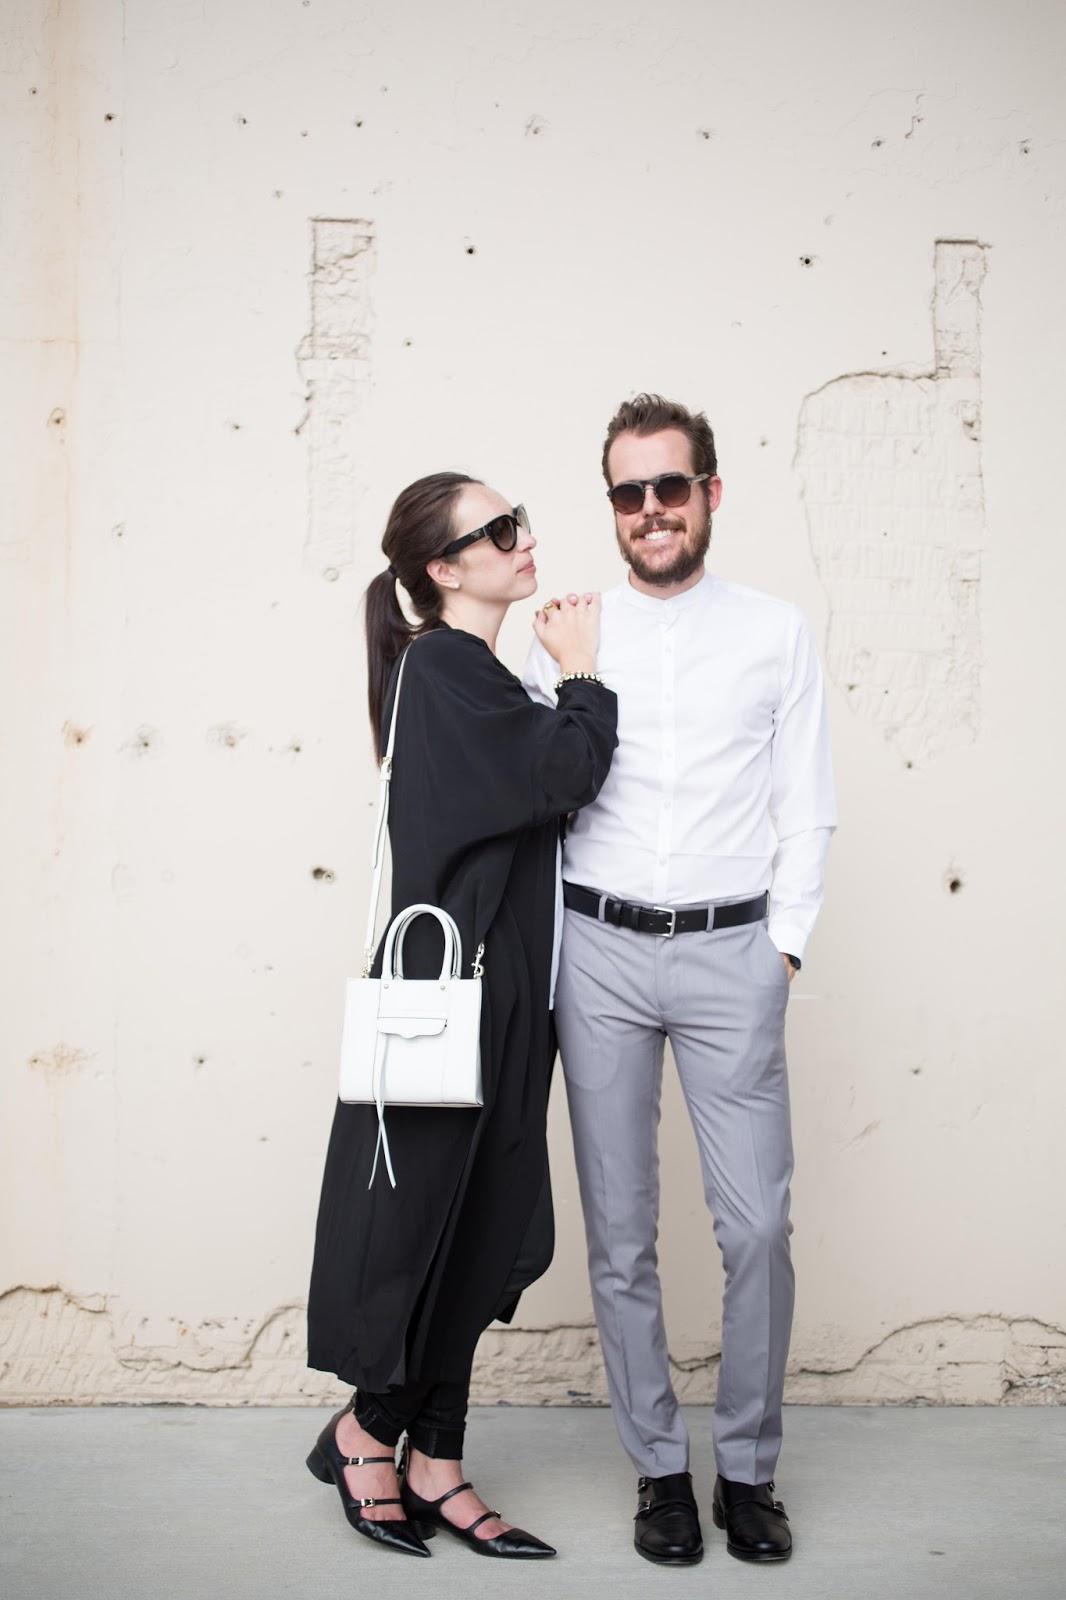 couples fashion style minimalist duster coat prada topman zara